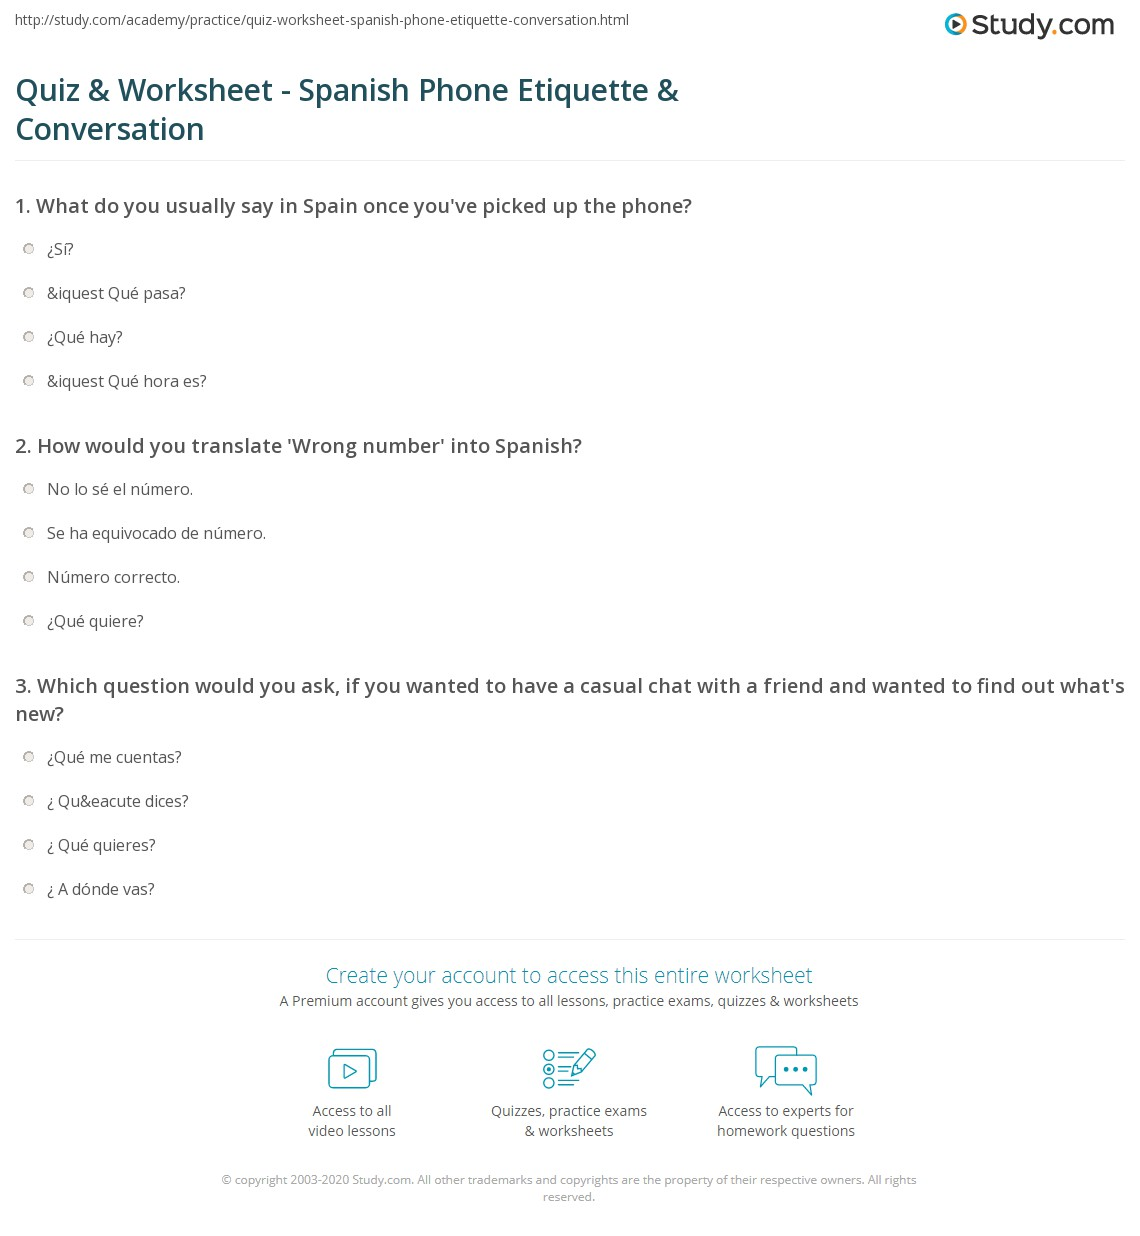 Quiz & Worksheet - Spanish Phone Etiquette & Conversation